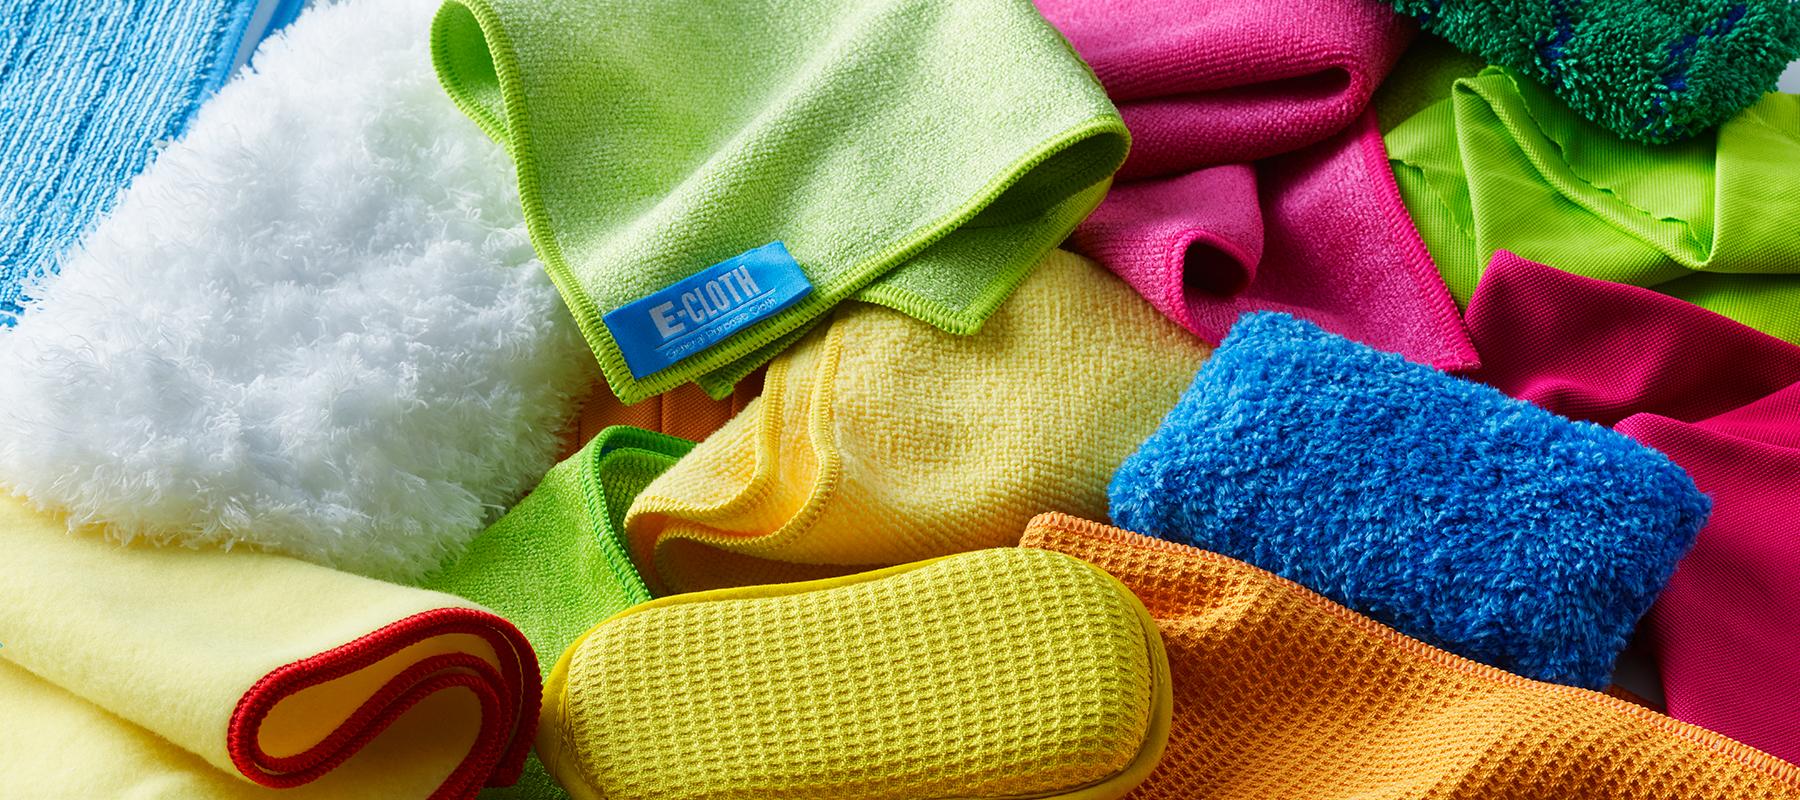 E-Cloth Pads und Tücher putzen das ganze Haus